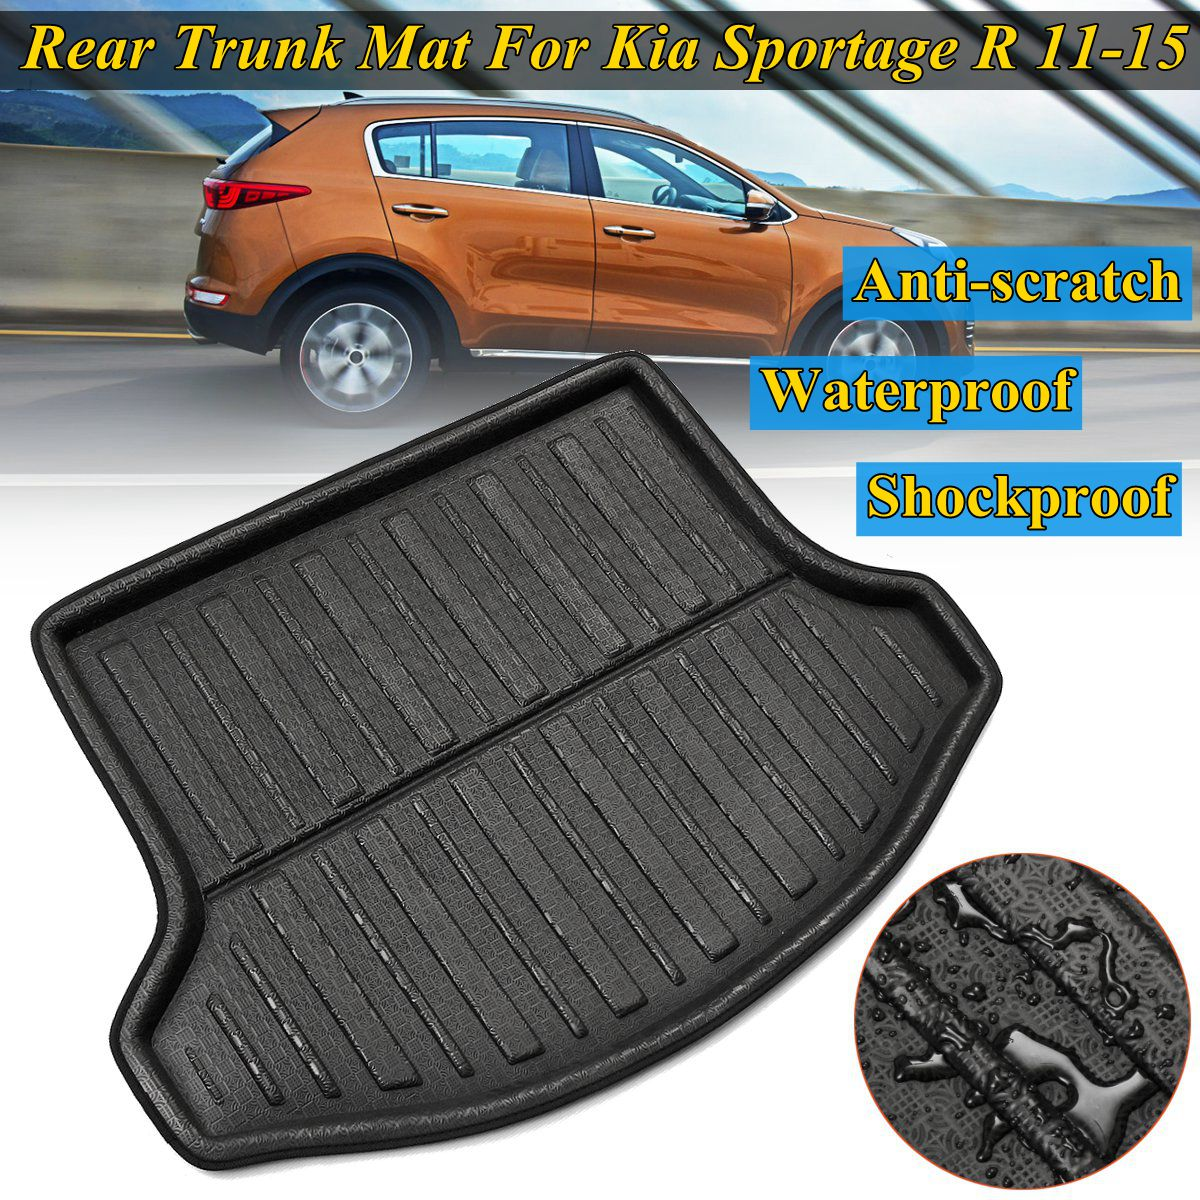 Rear Floor Trunk For Kia Sportage R 2011 2012 13 14 2015 Floor Mat Cargo Boot Liner Car styling Accessories Interior Waterproof